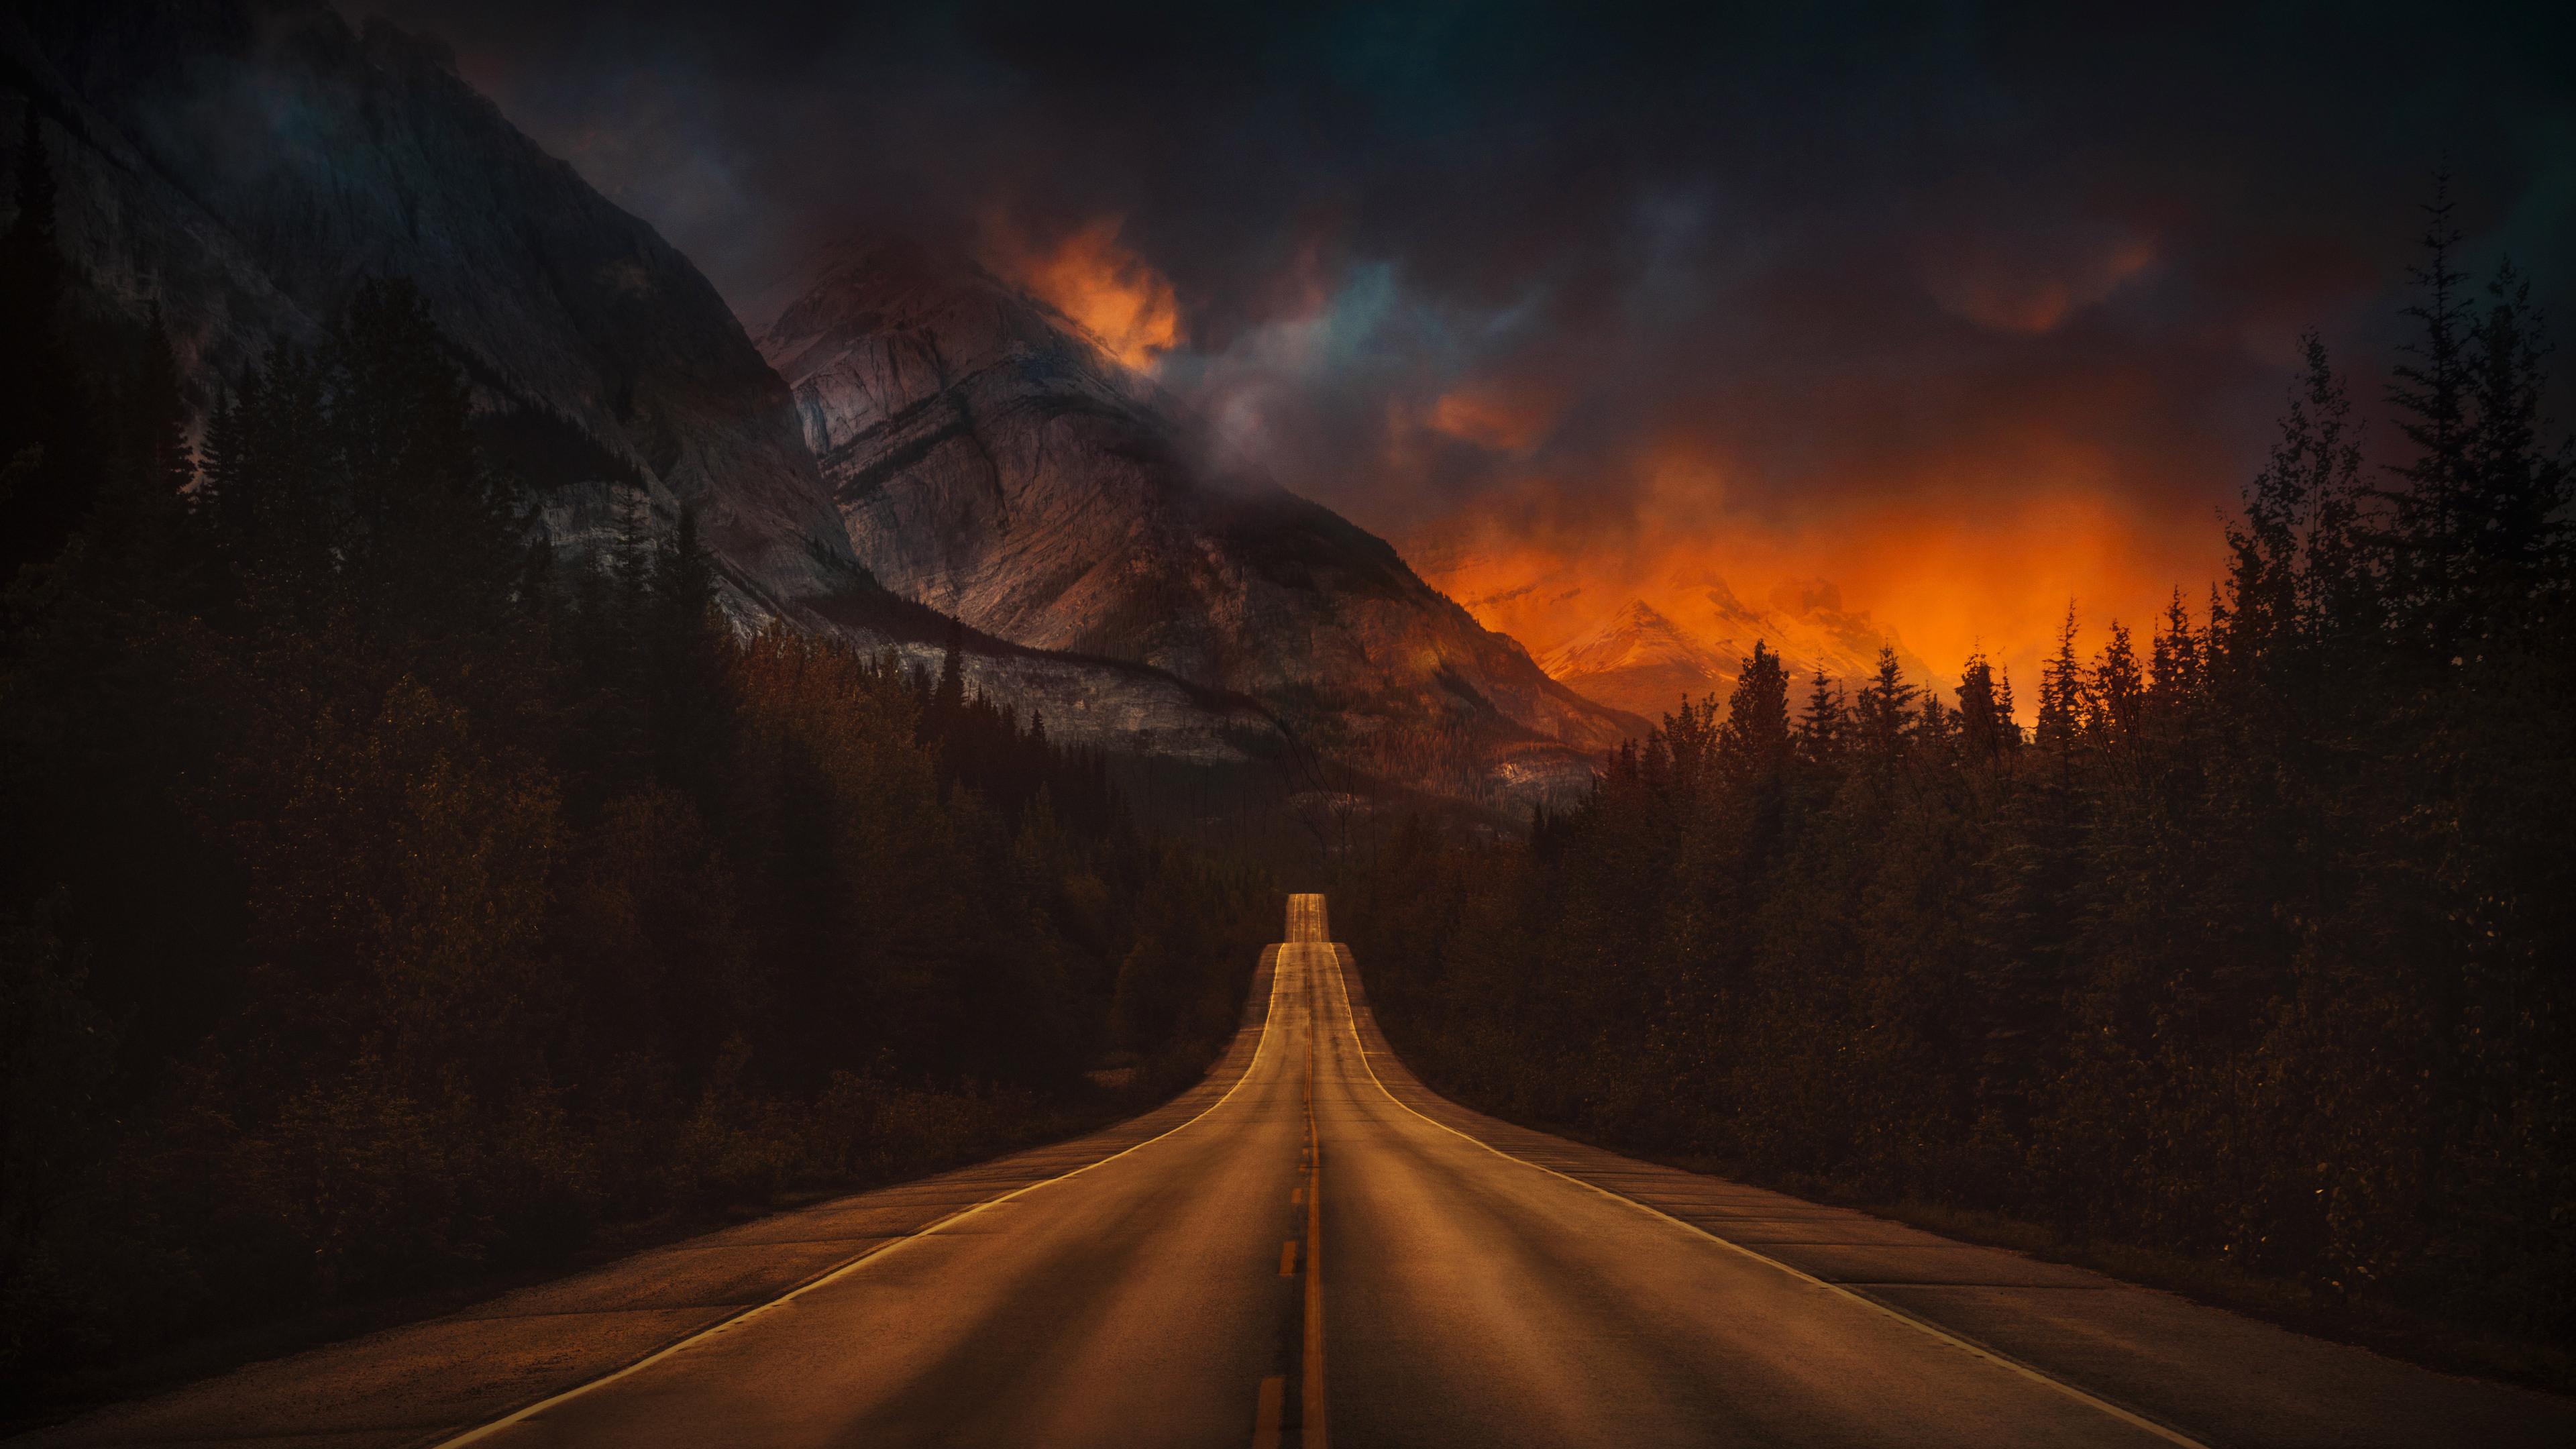 3840x2160 mountain nature night road 4k 4k hd 4k - Night mountain wallpaper 4k ...